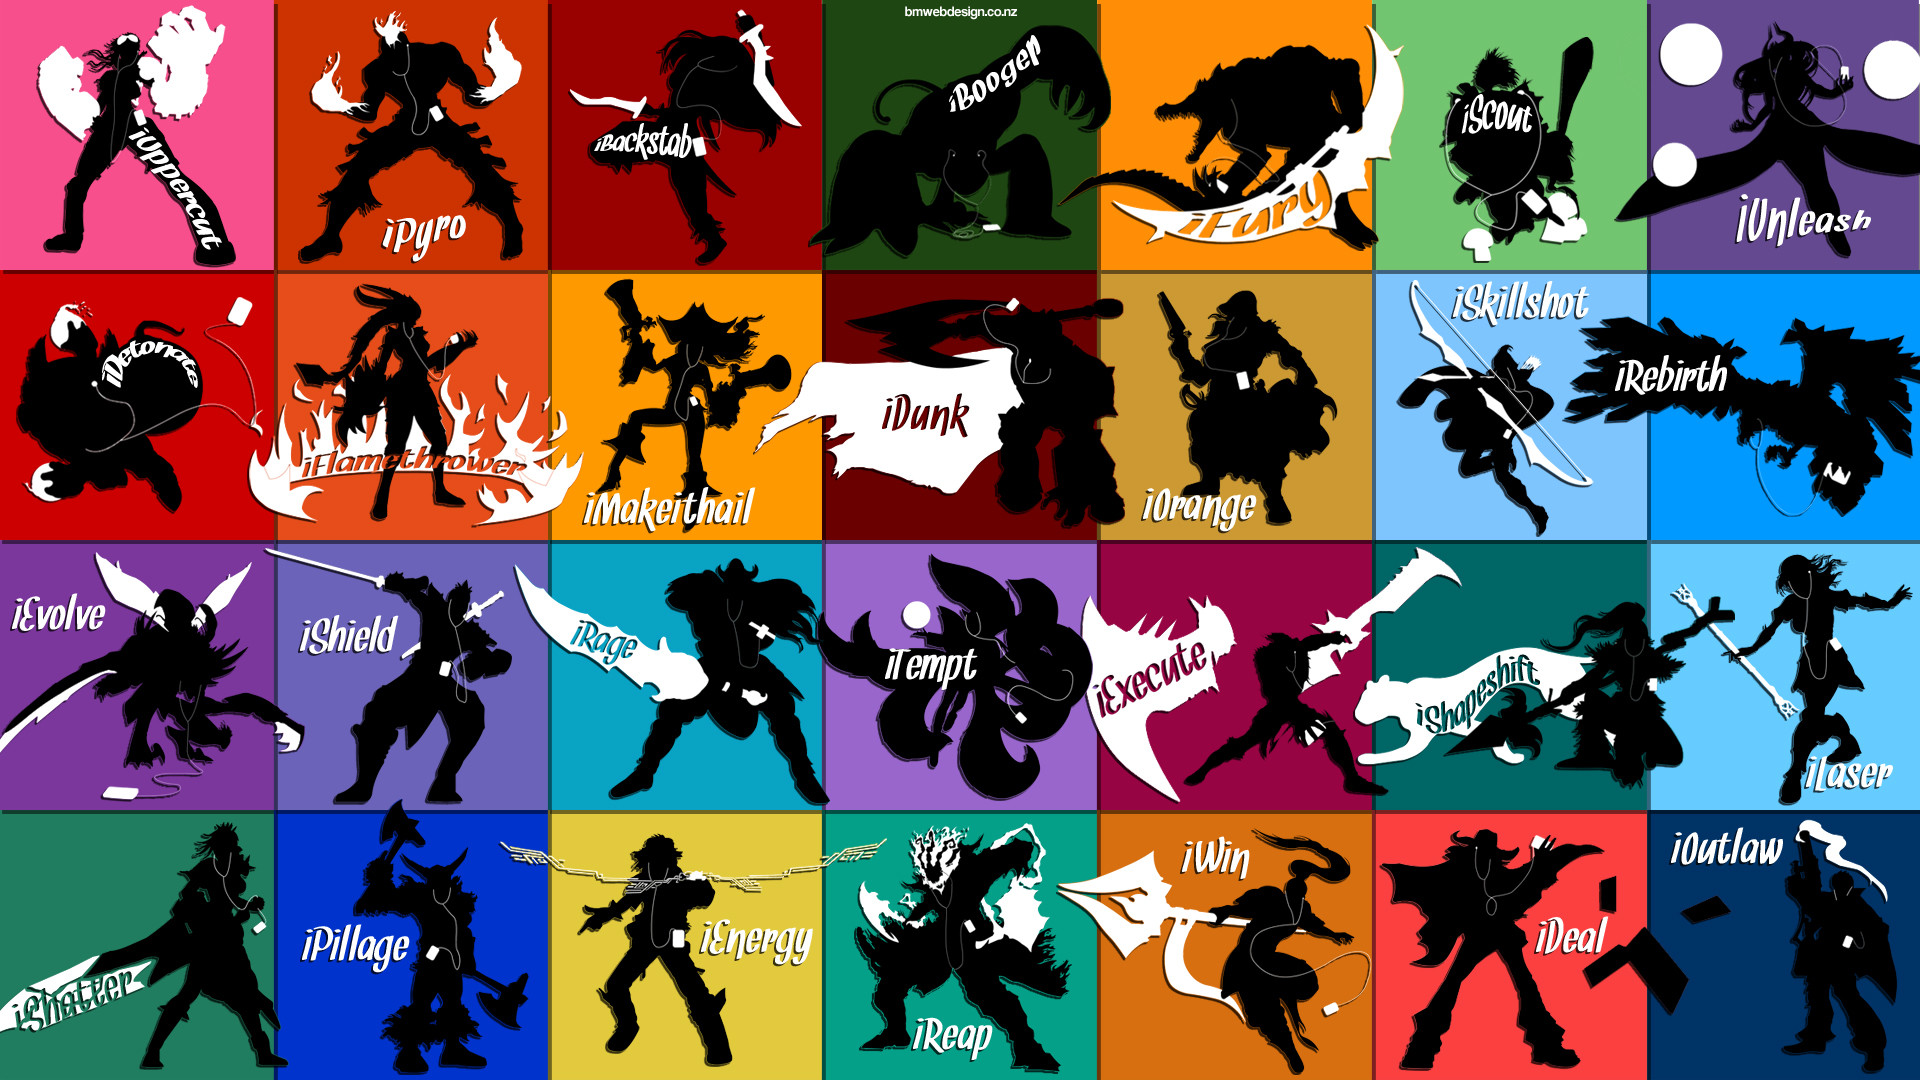 League Of Legends Wallpaper (37 Wallpapers)